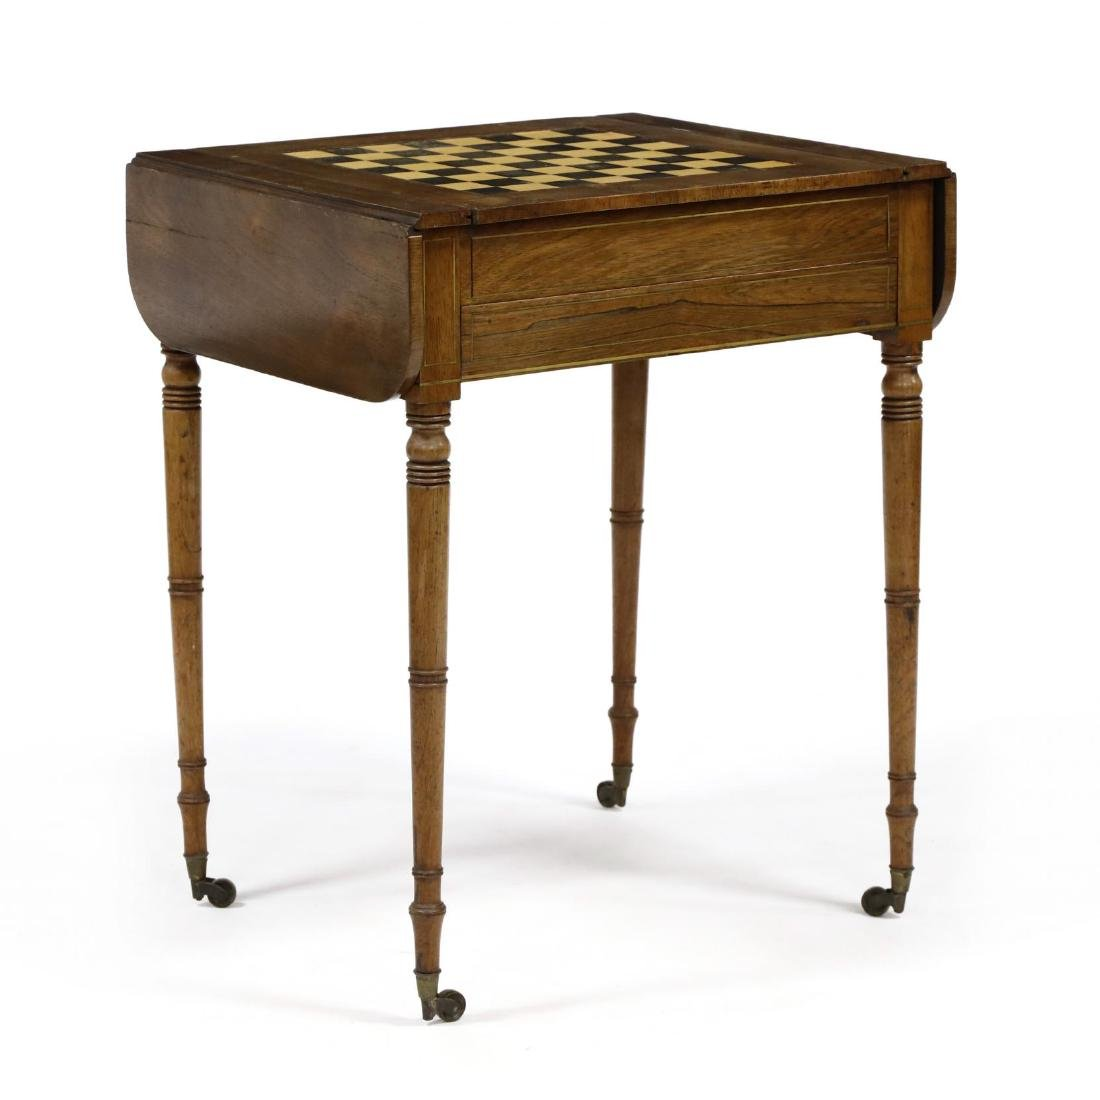 English Regency Game Table